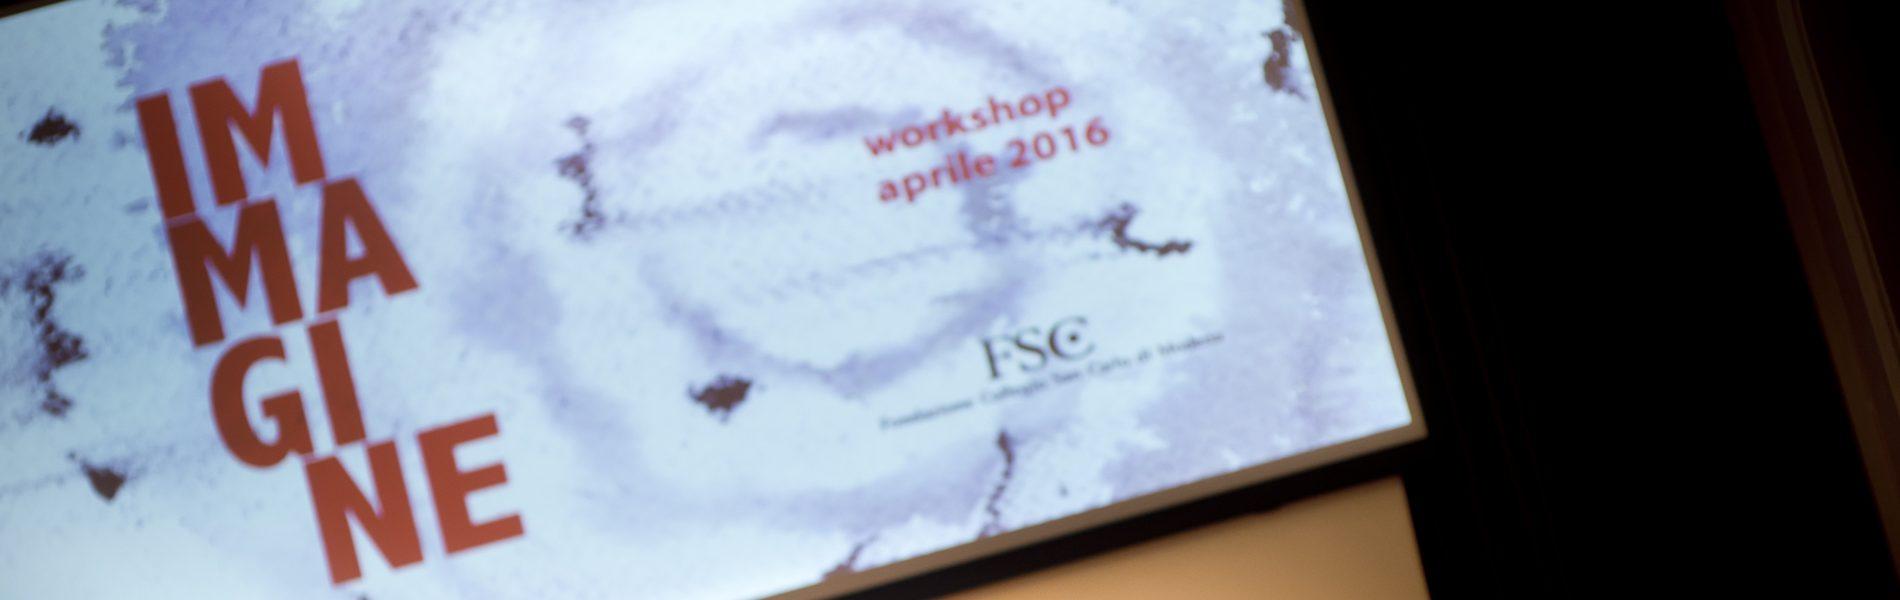 workshop_immagine